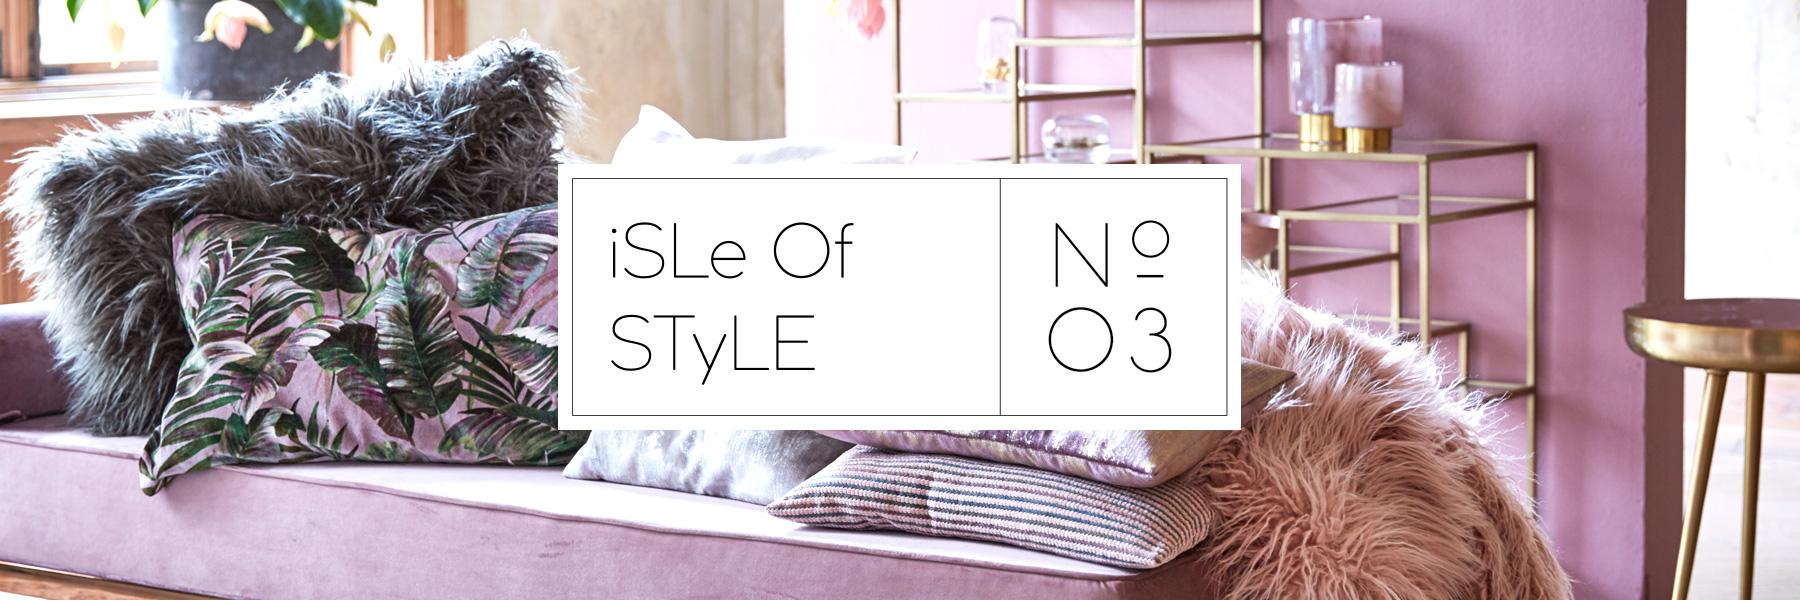 Proflax Isle of Style